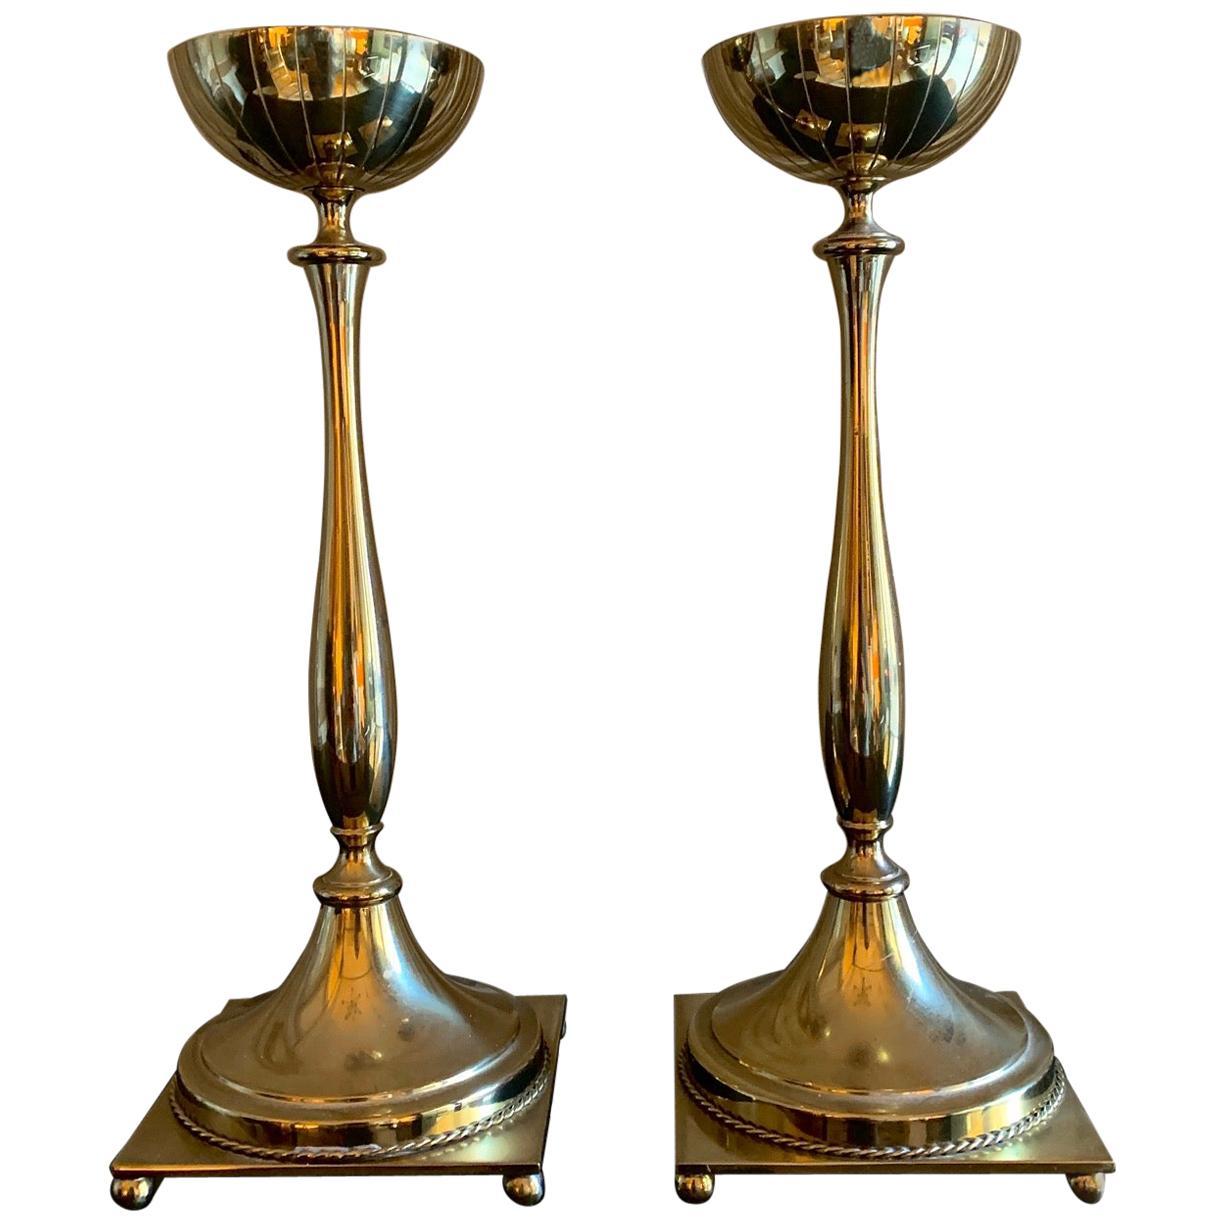 Pair of Mid-Century Modern Swedish Candlesticks in Brass